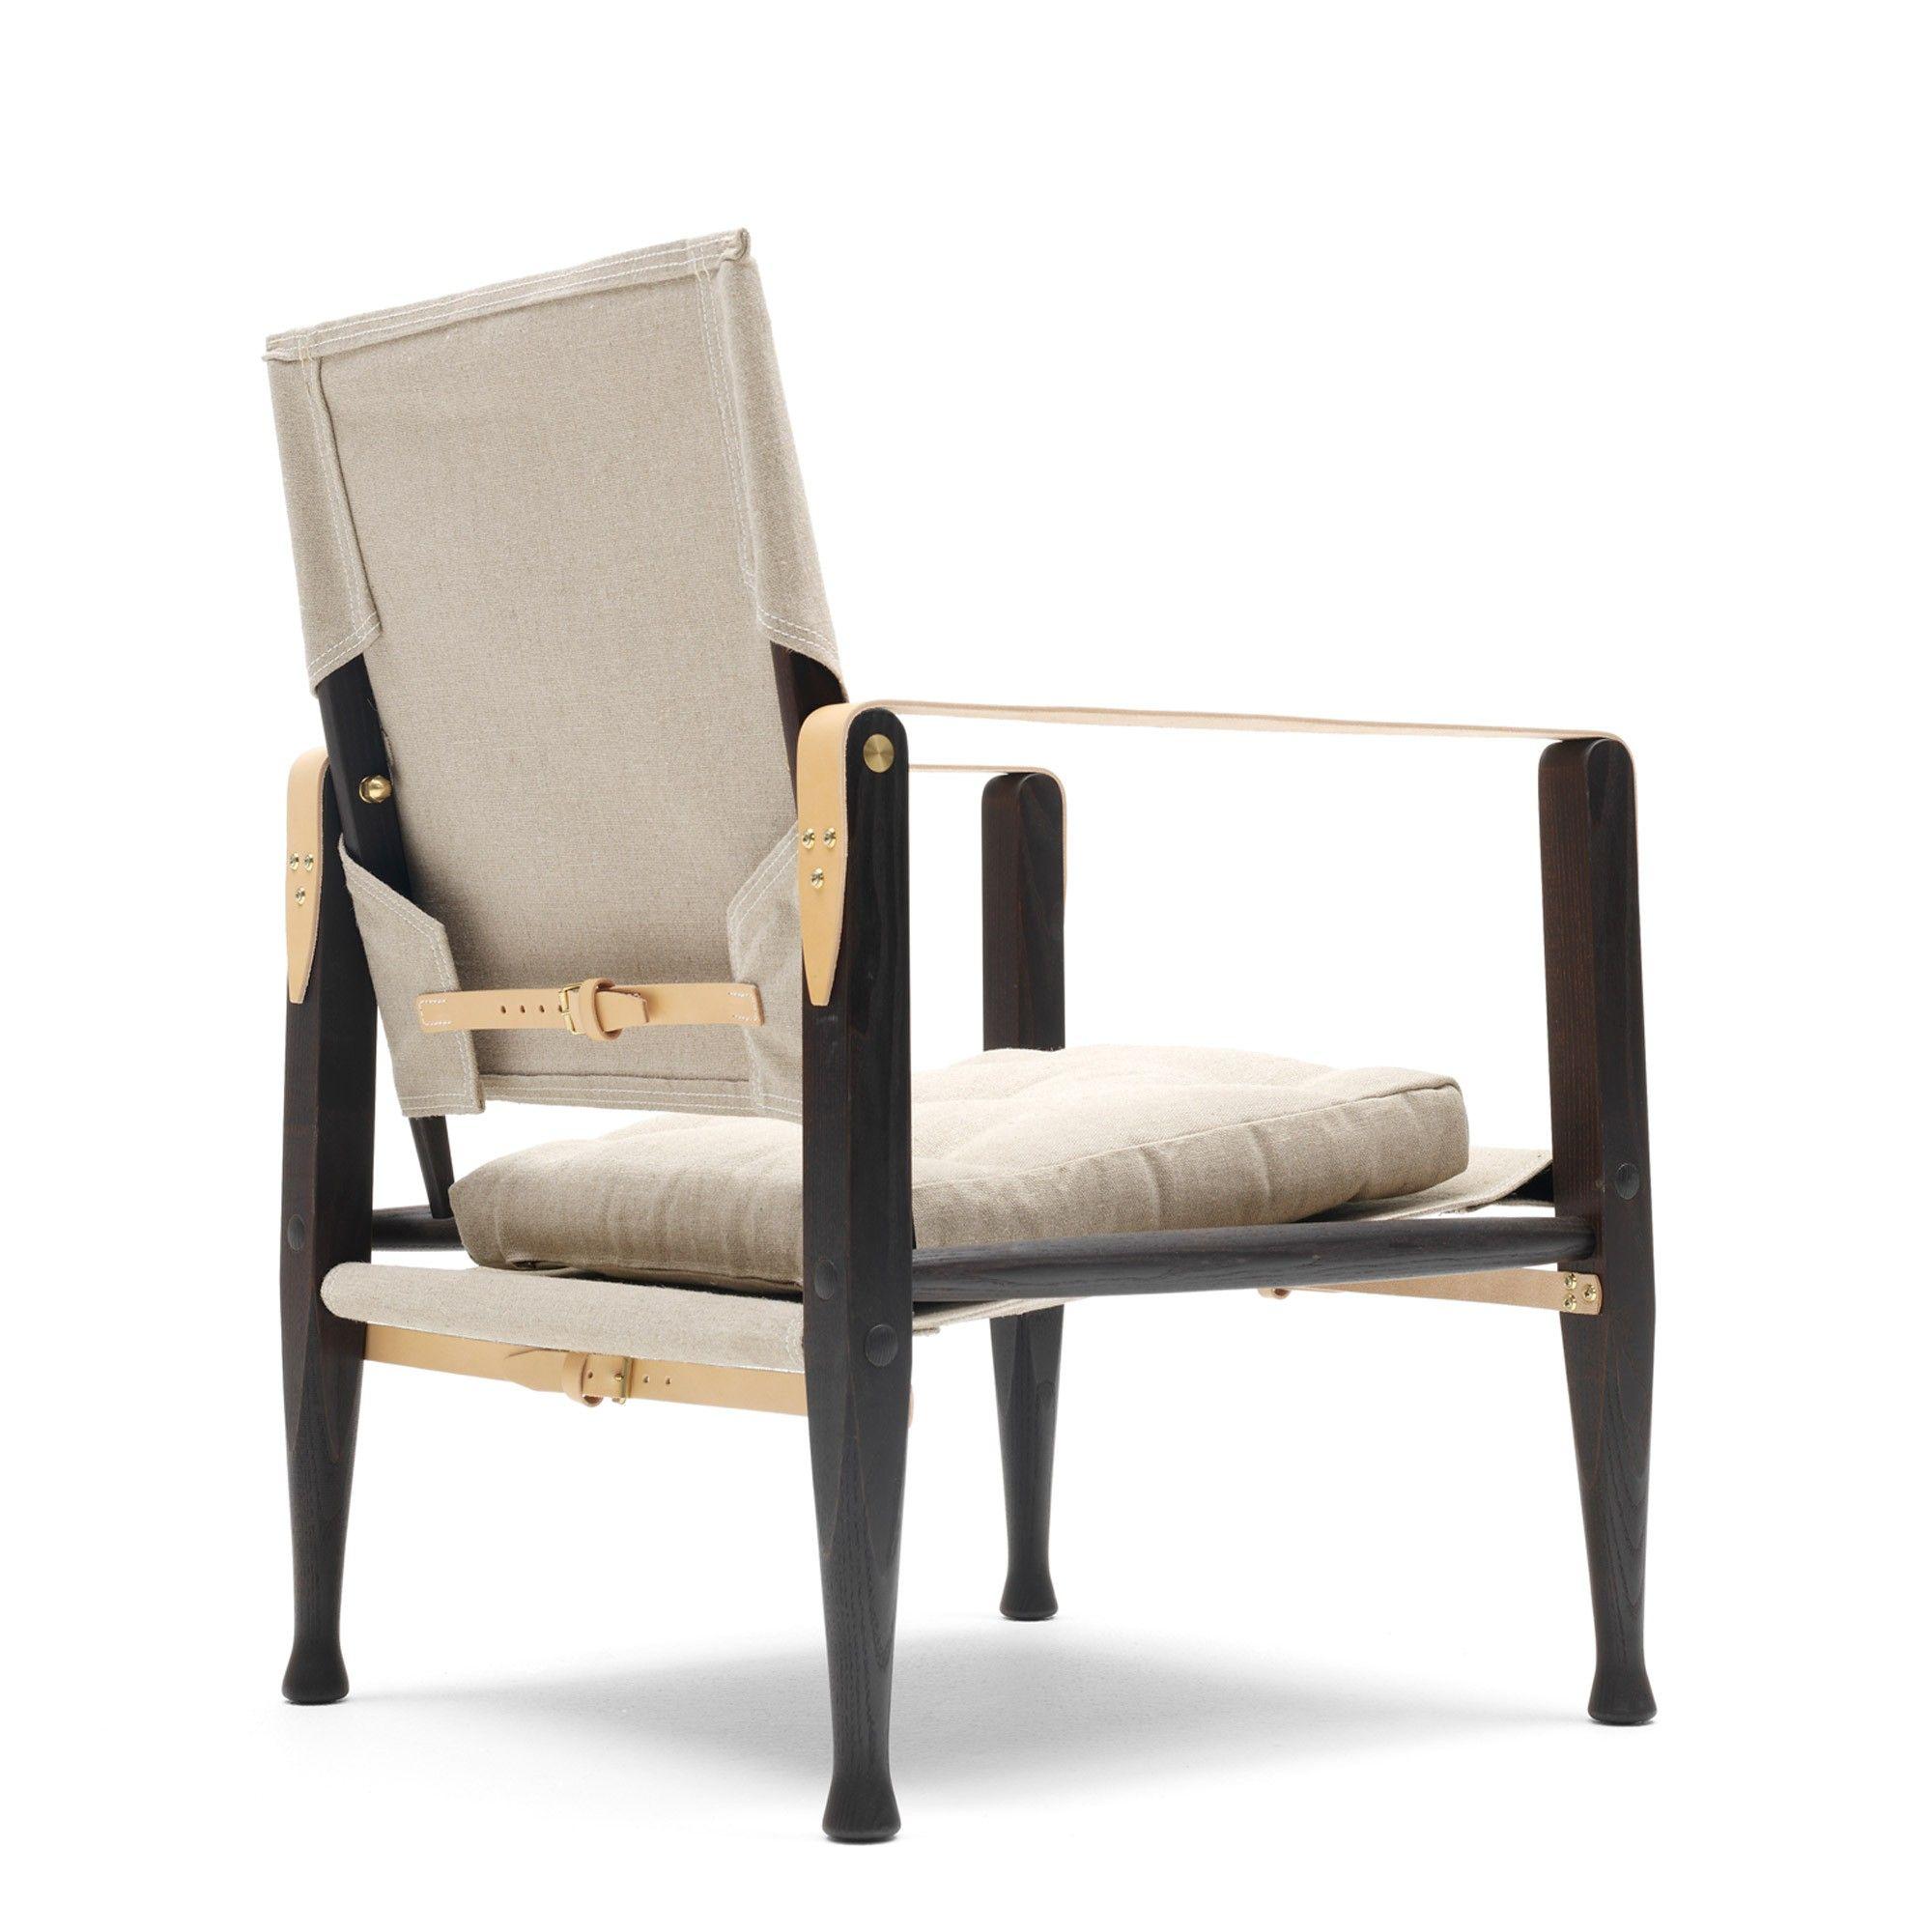 Pin By Iffah Fathin On Style: Furniture, Furniture Design